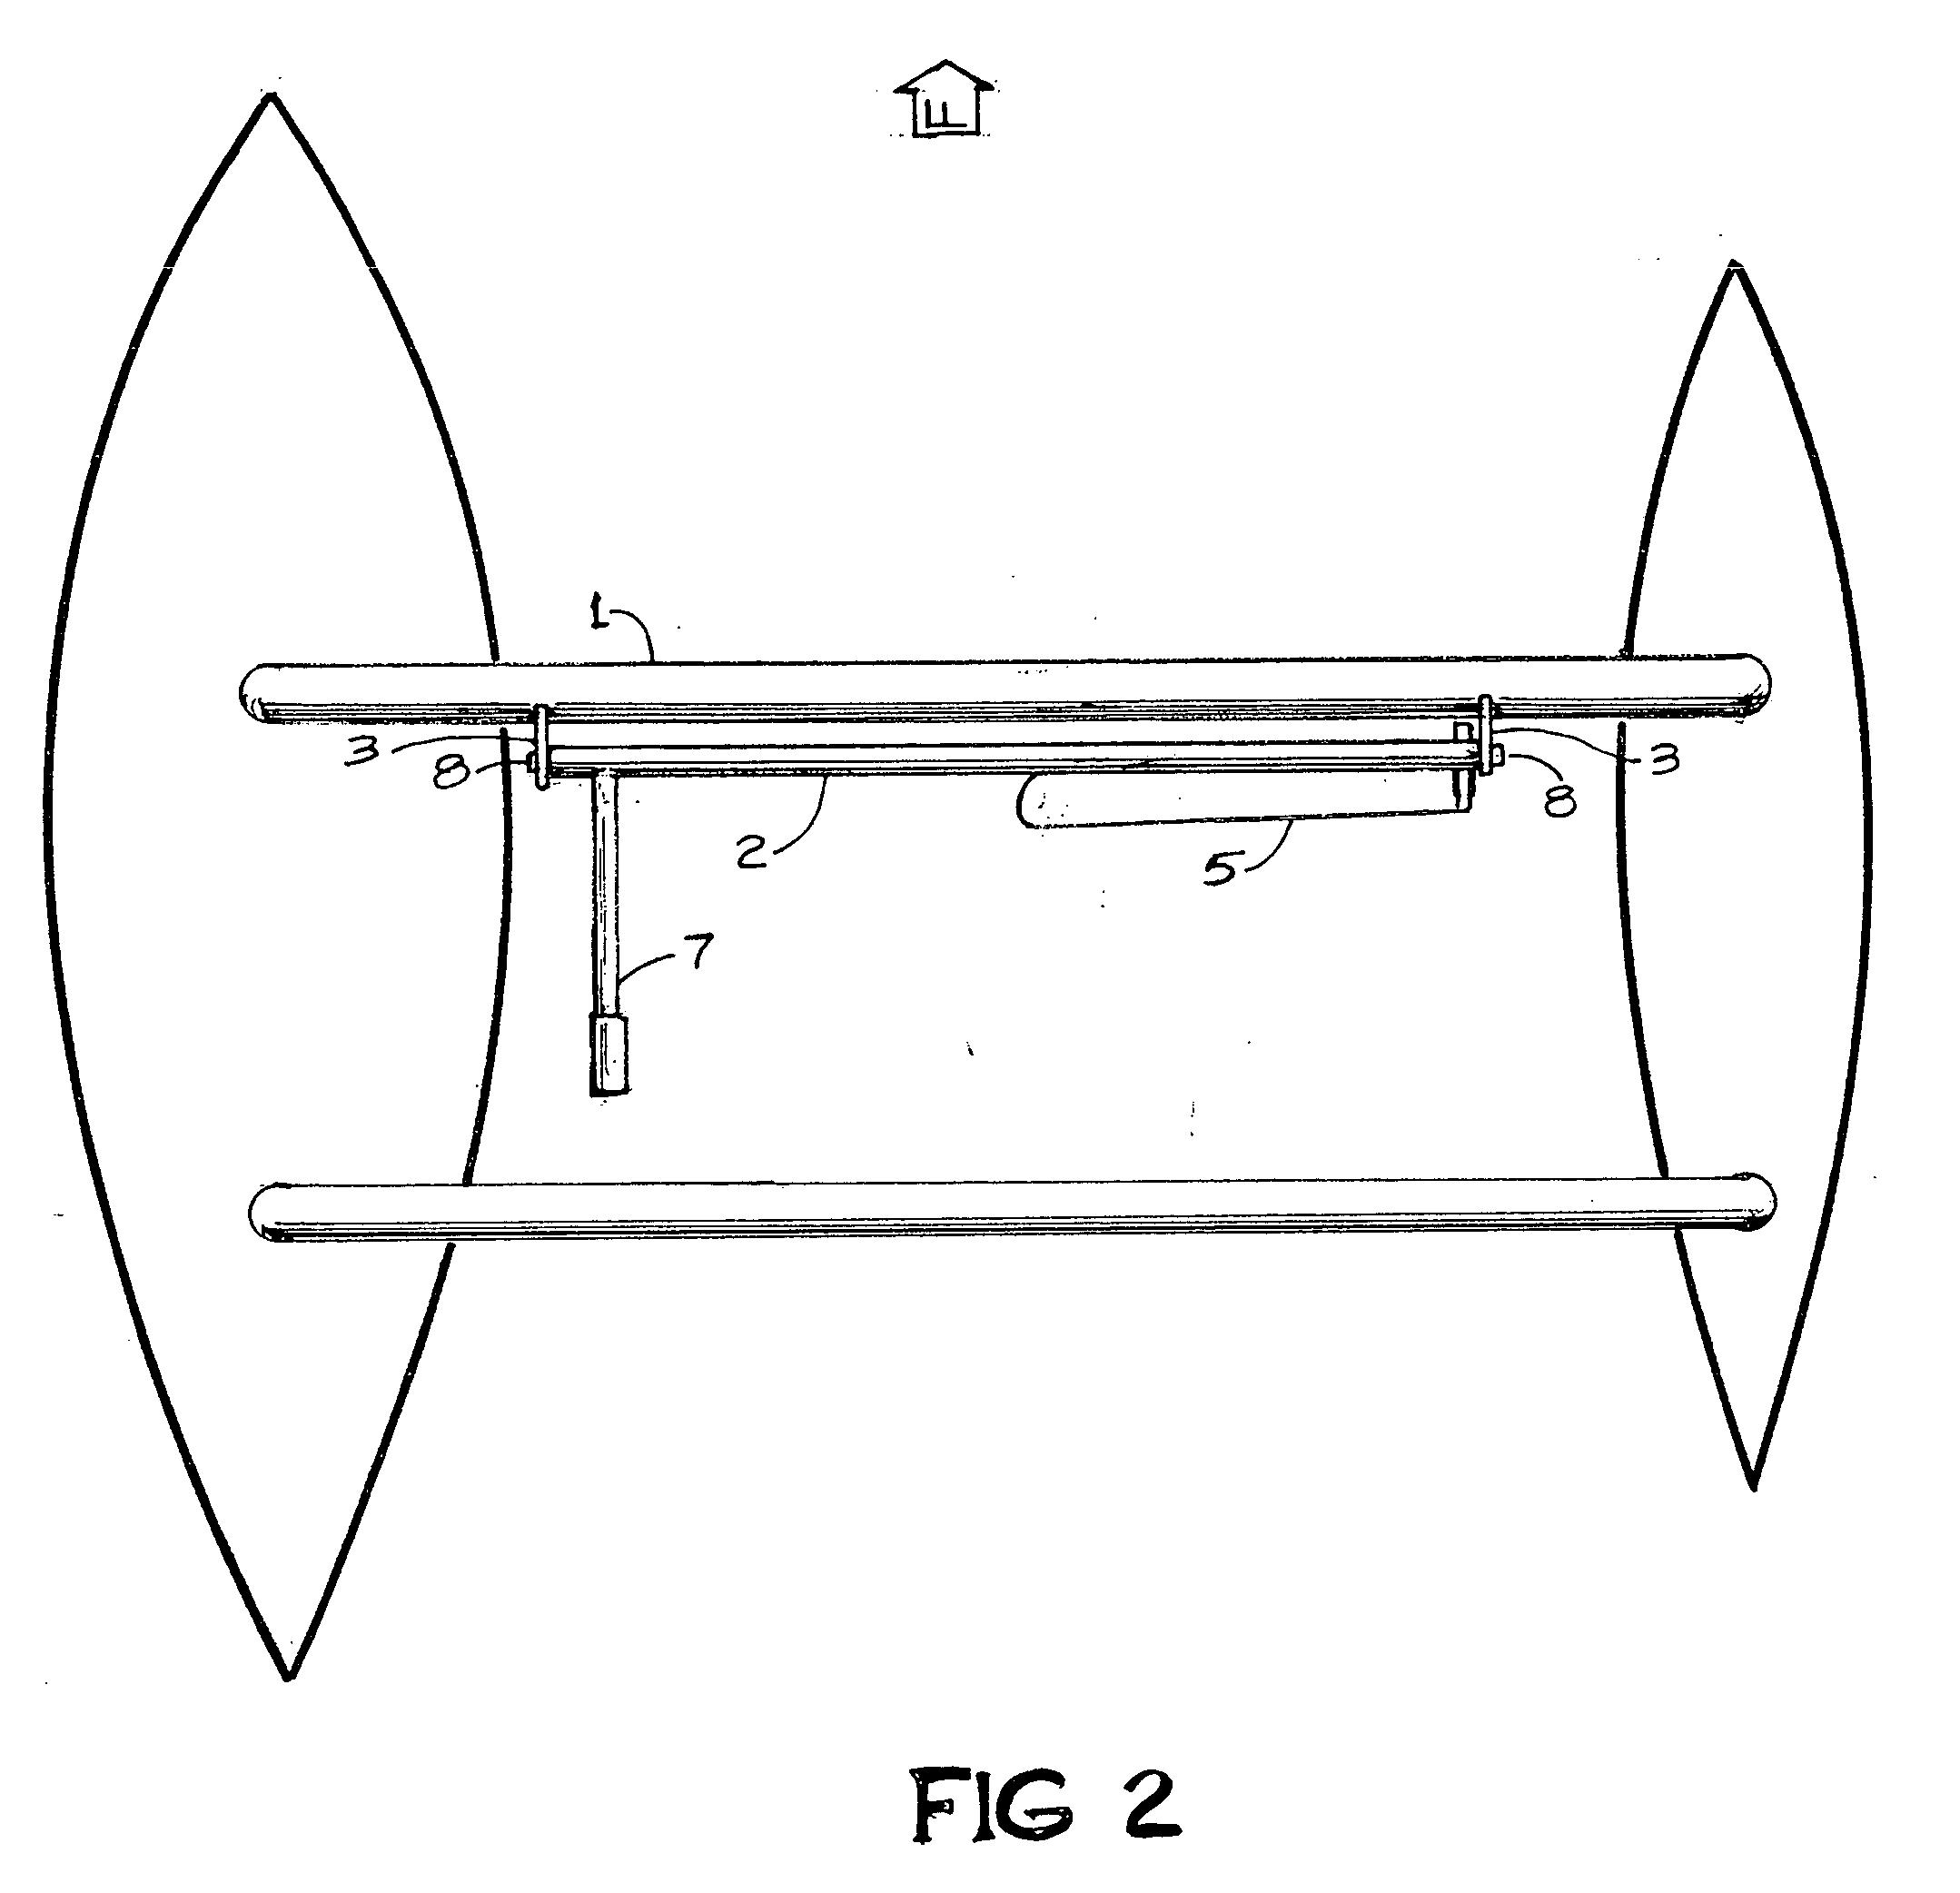 patent us20040089217 manual hydrofoil and spar truss. Black Bedroom Furniture Sets. Home Design Ideas